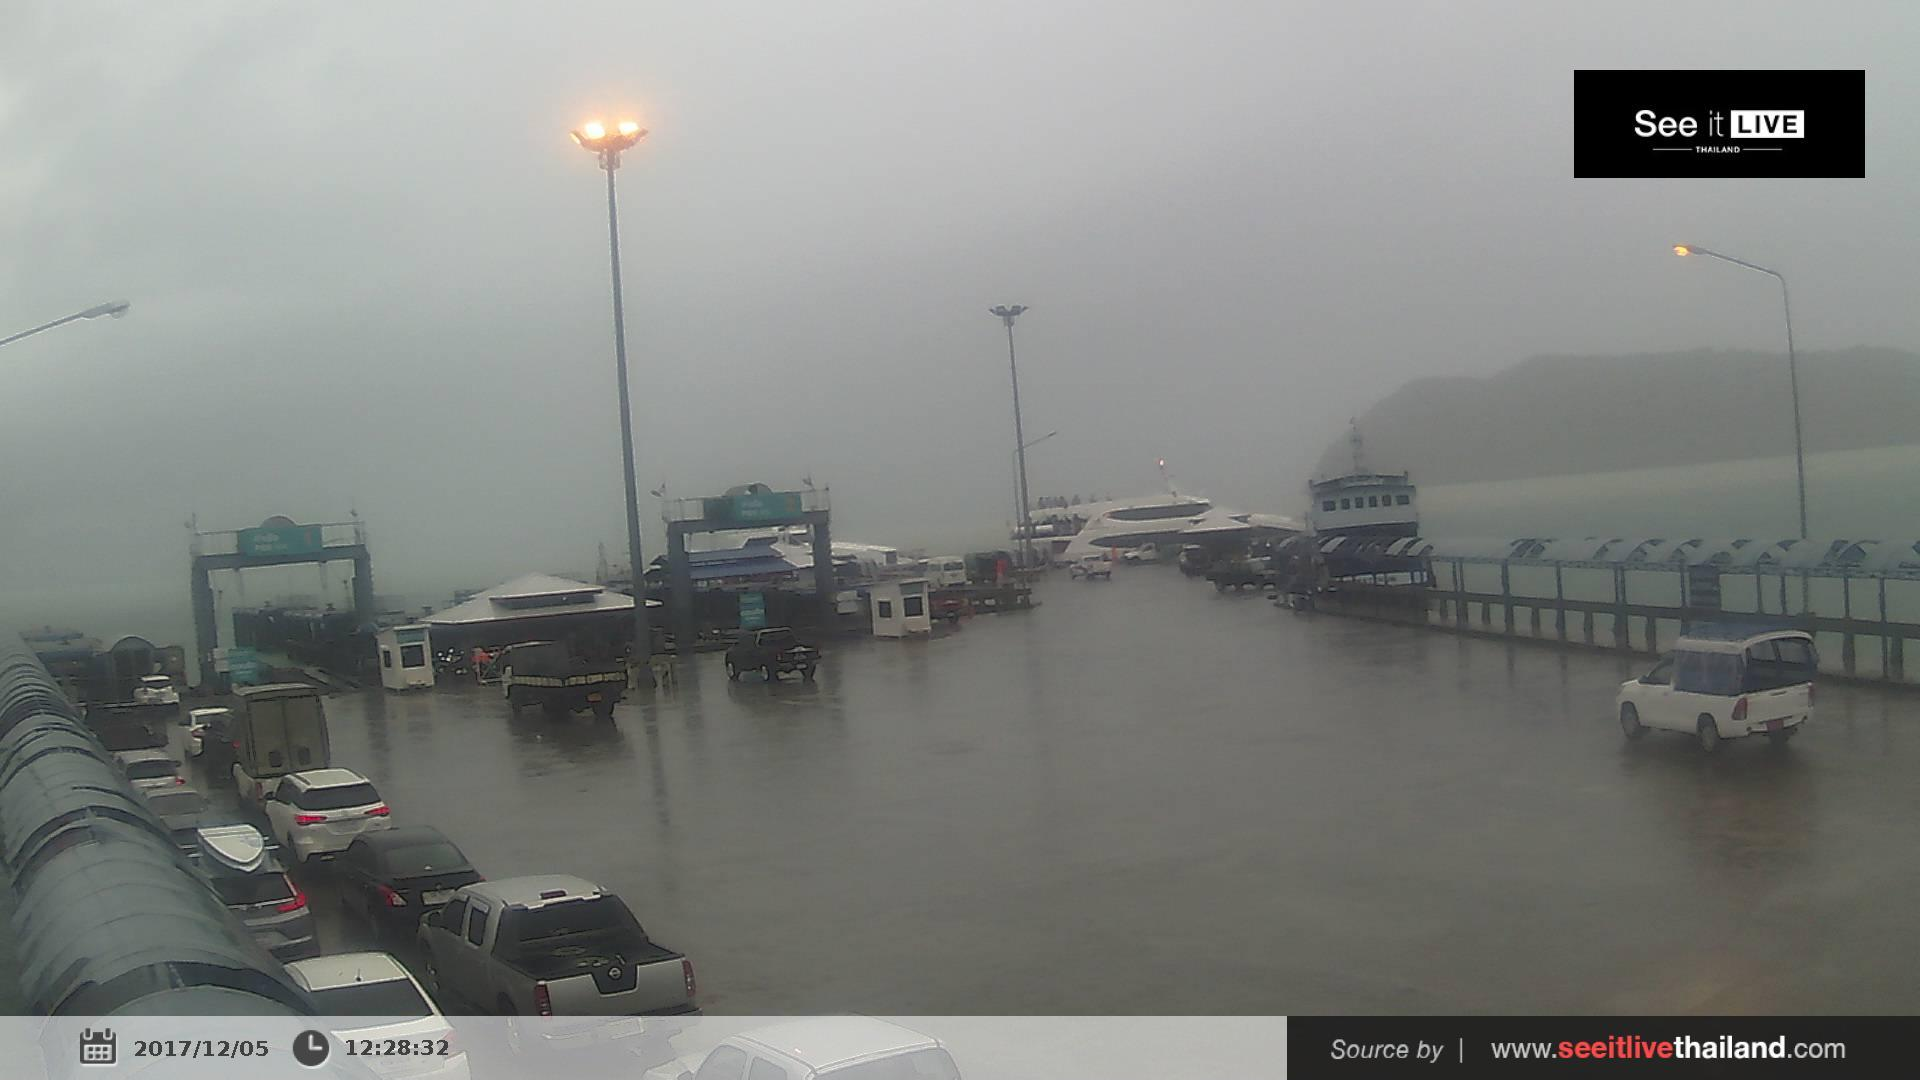 Webcam บ้านในวก: Phangan Pier